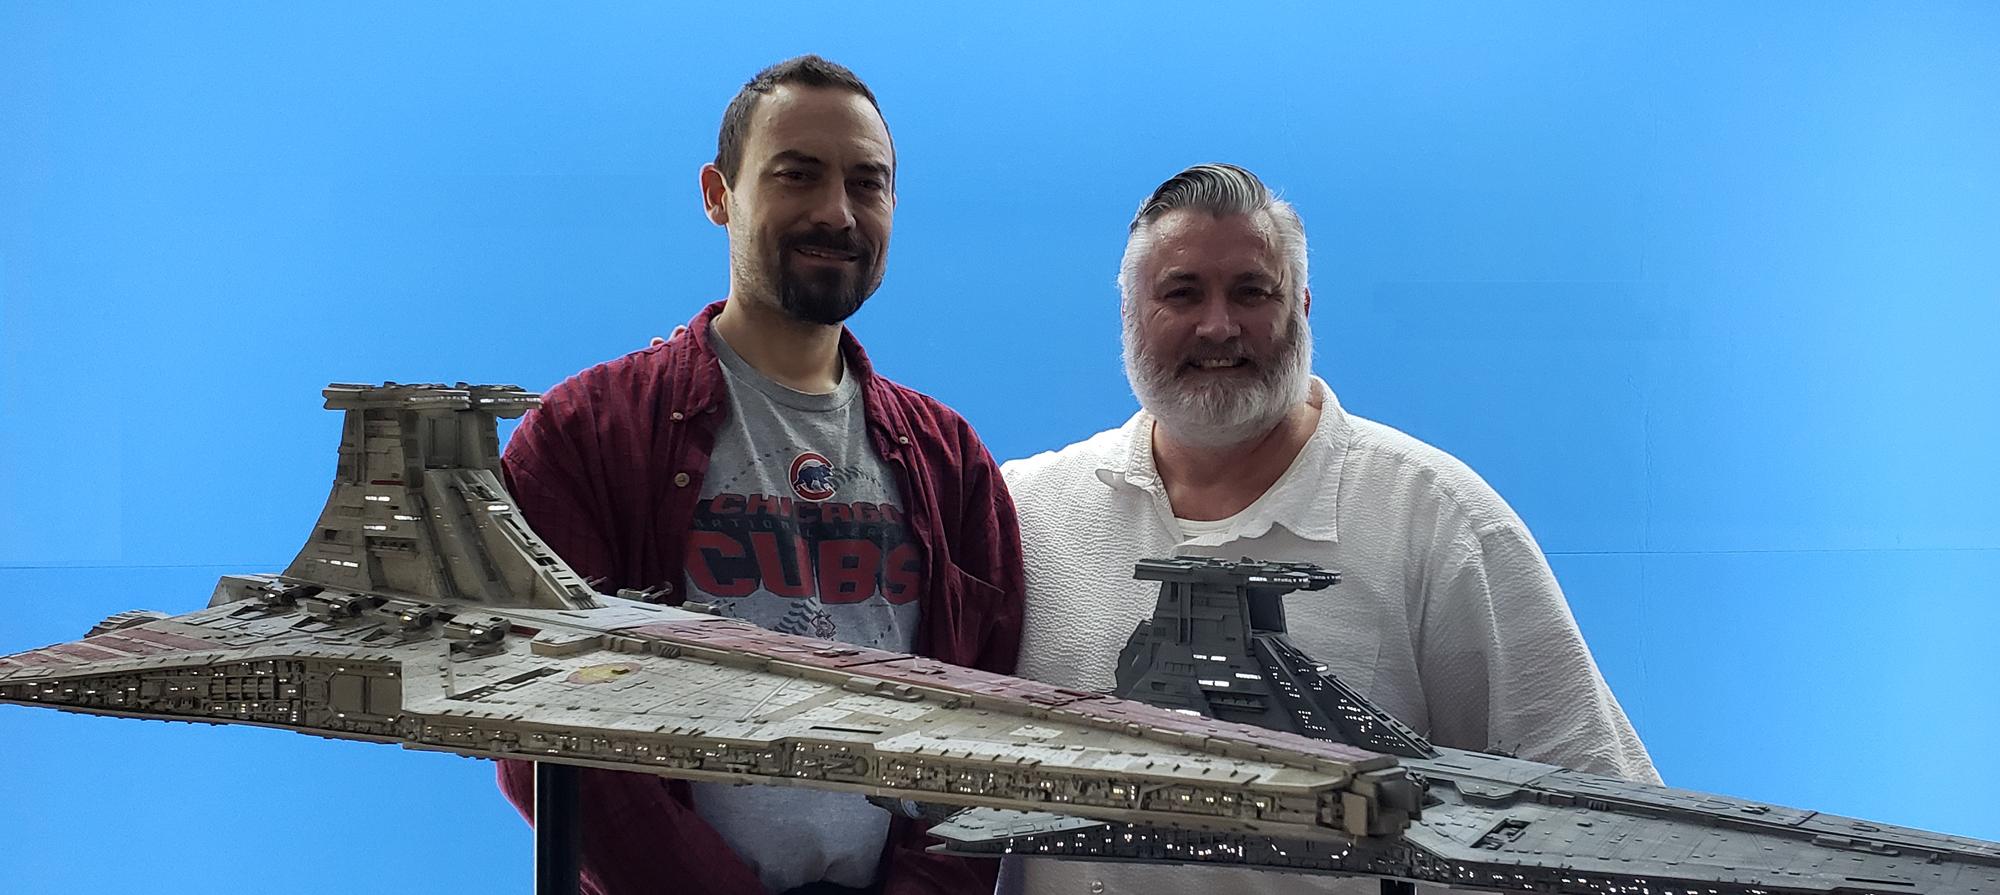 Dan Grumeretz (L) and Kurt Kuhn with Republic Star Destroyers